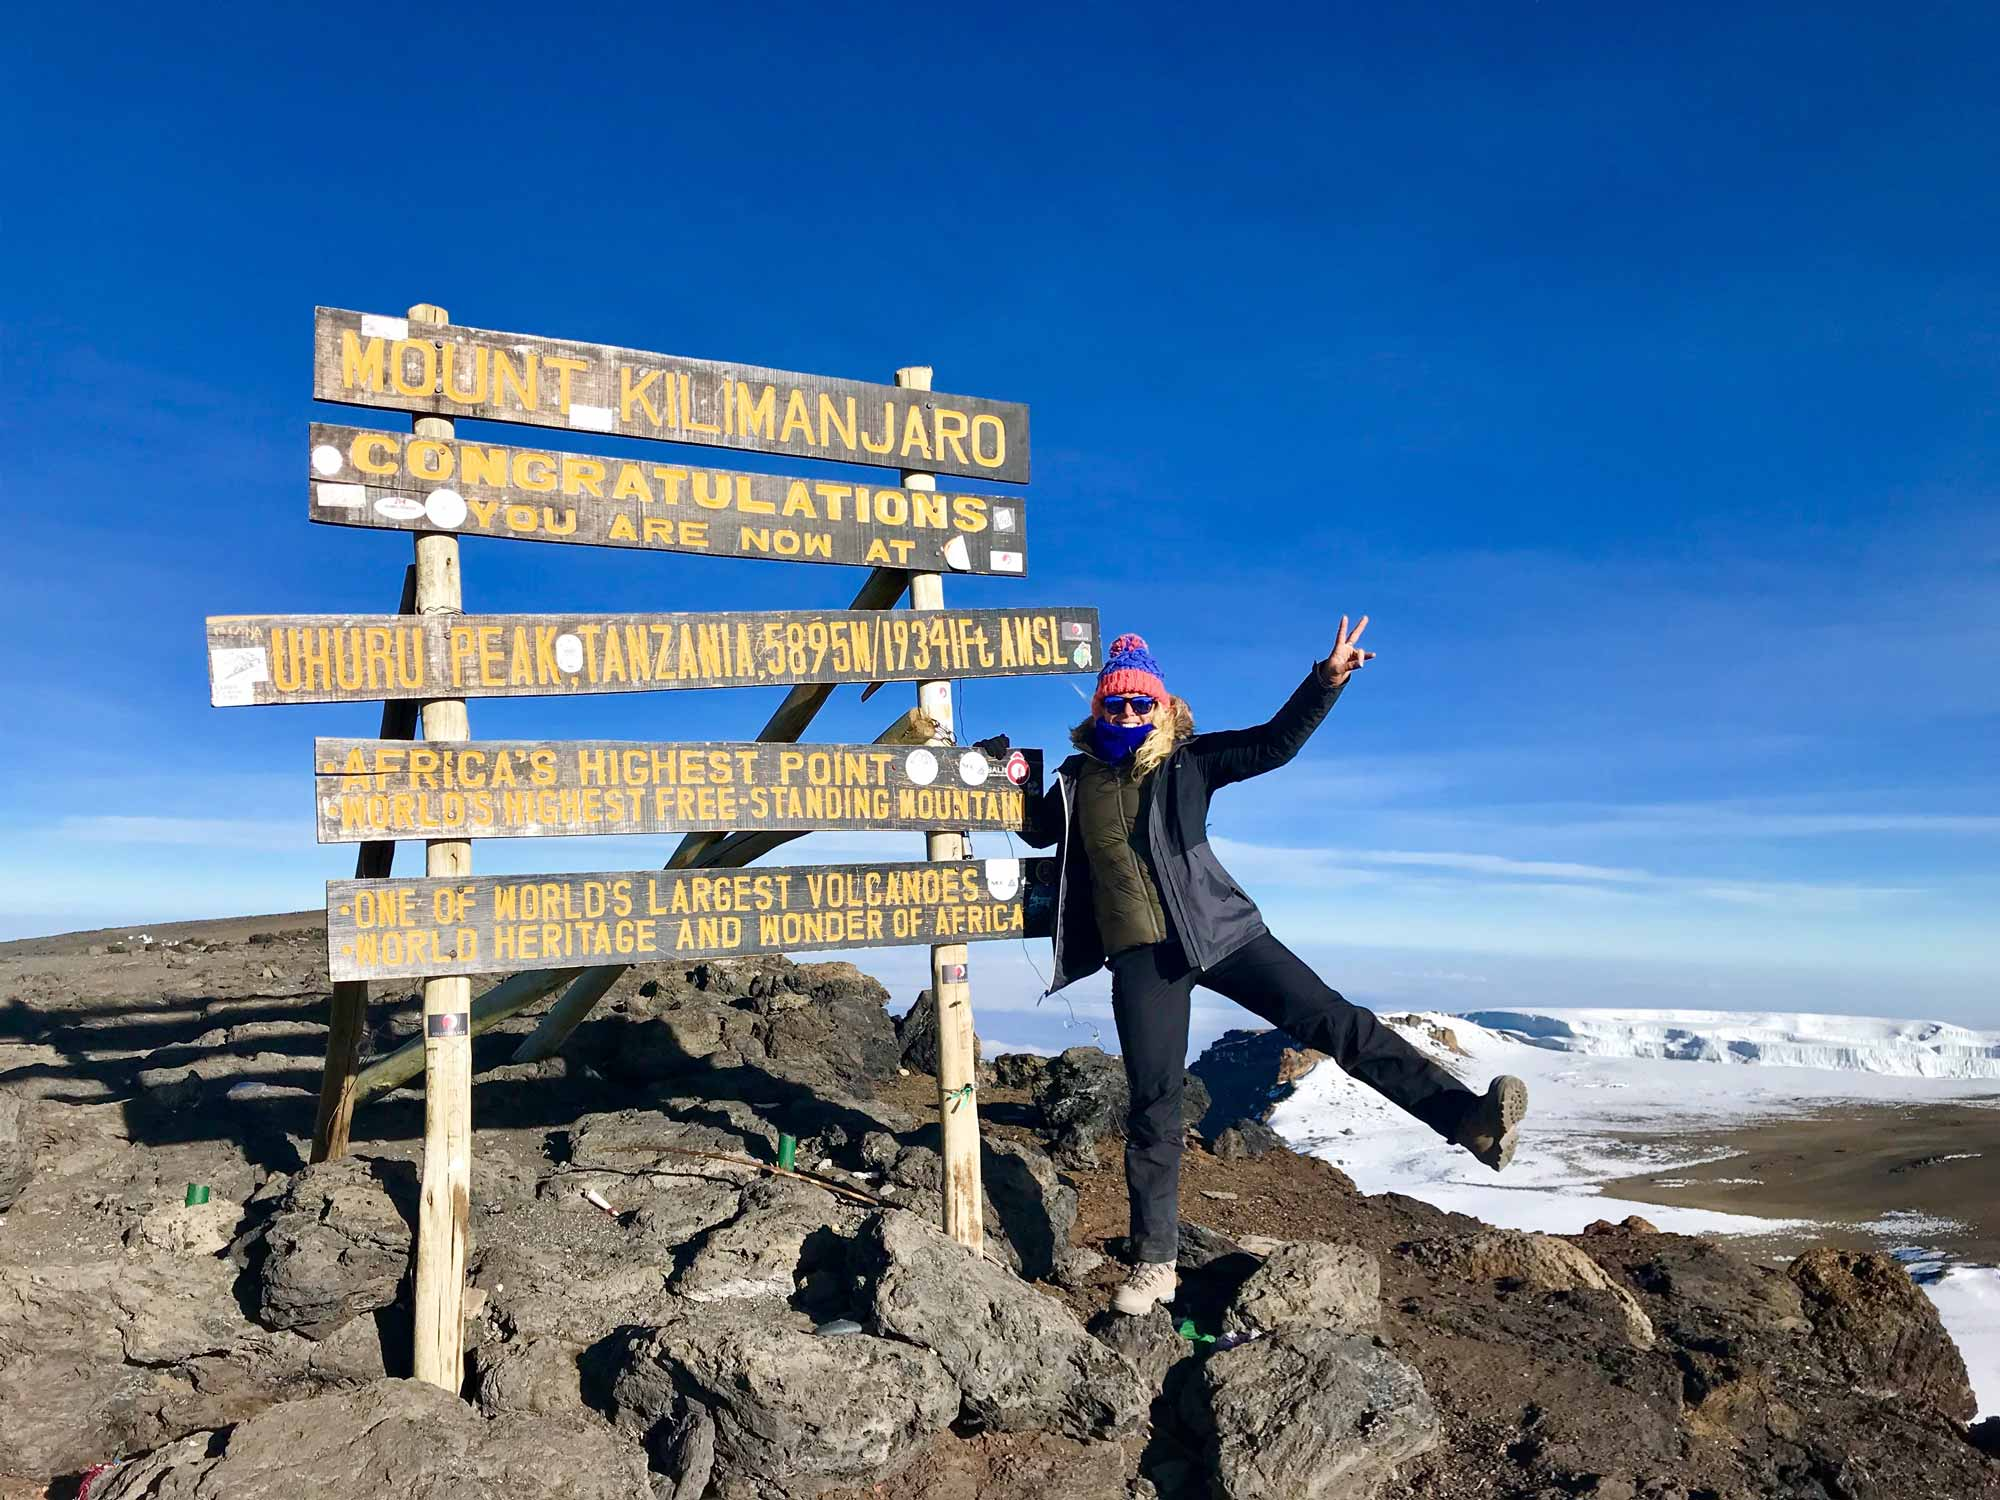 Explore Mount Kilimanjaro with UFIT Retreats team